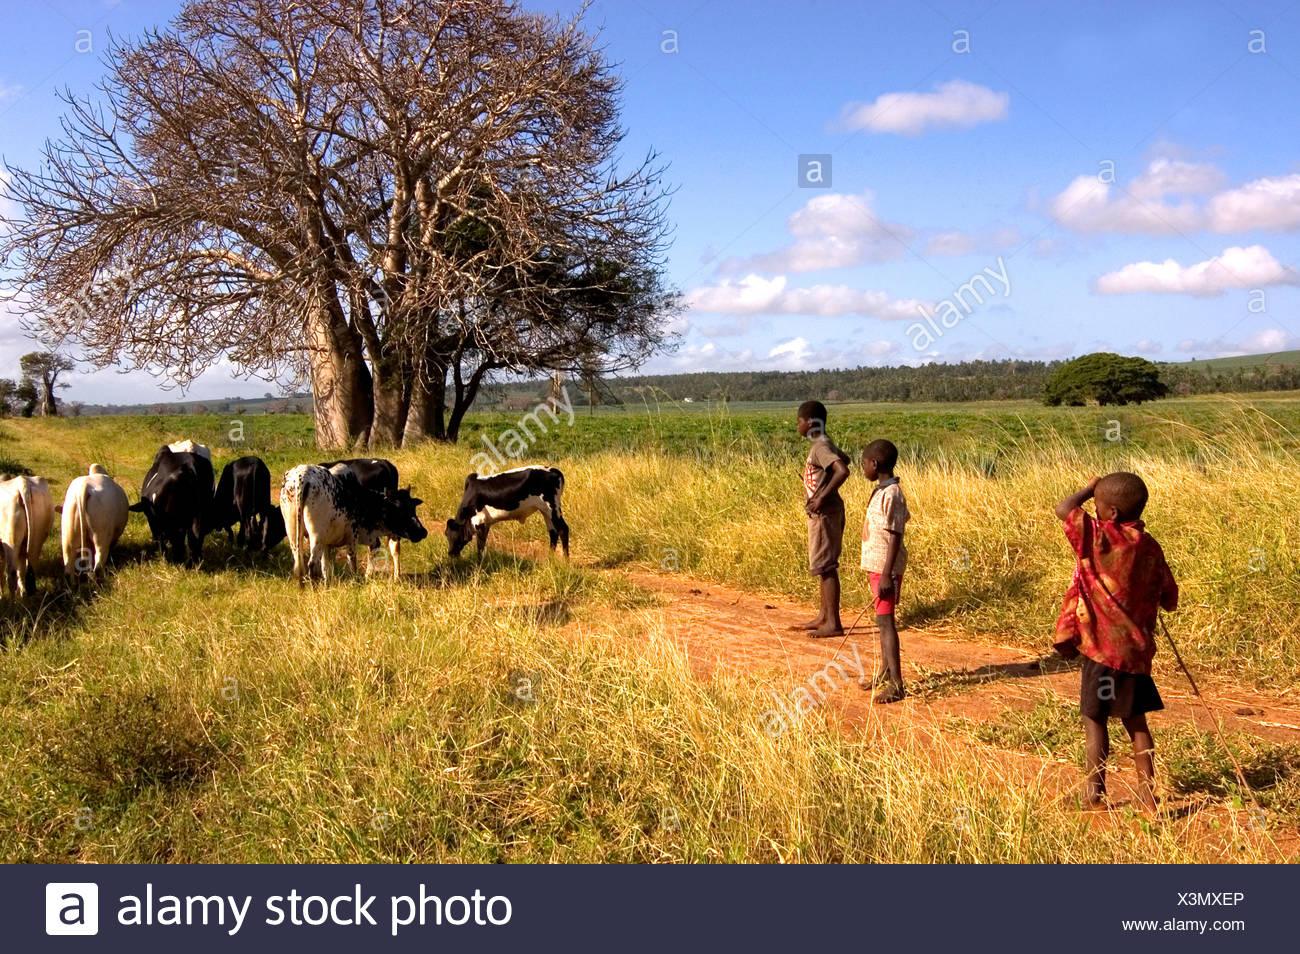 Hinterland, Kenya - Stock Image